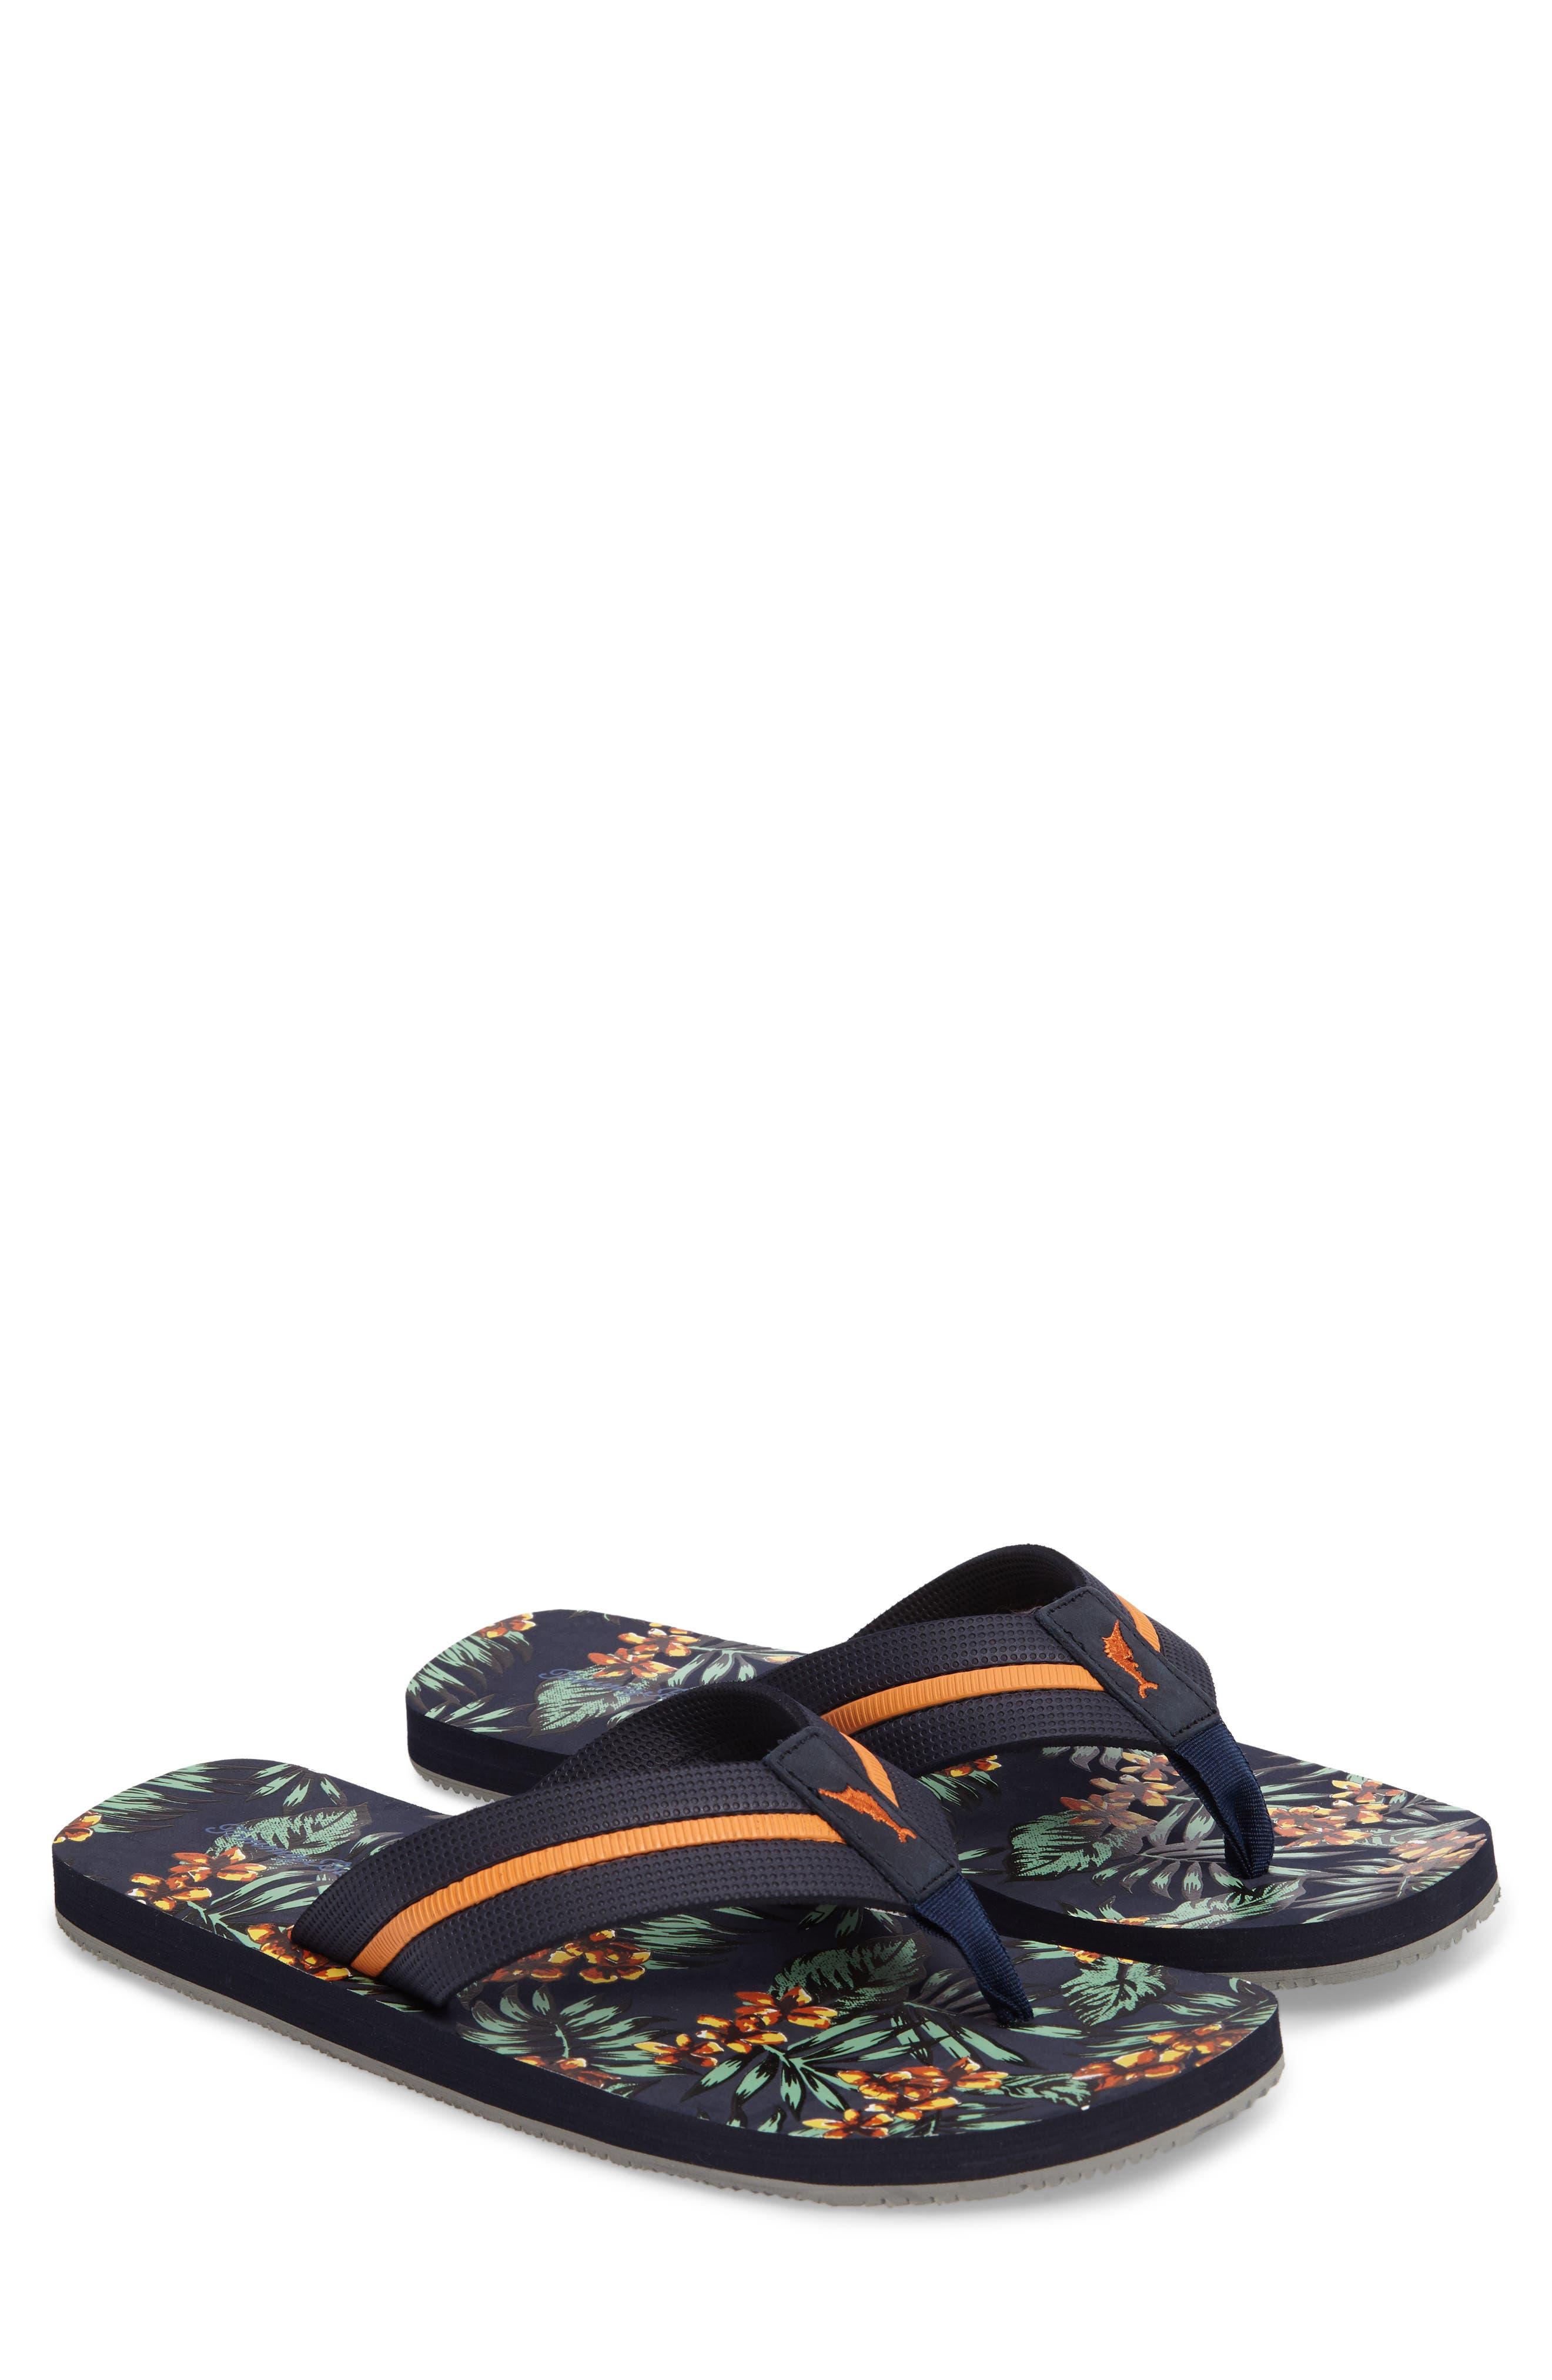 Taheeti Flip Flop,                         Main,                         color, 431